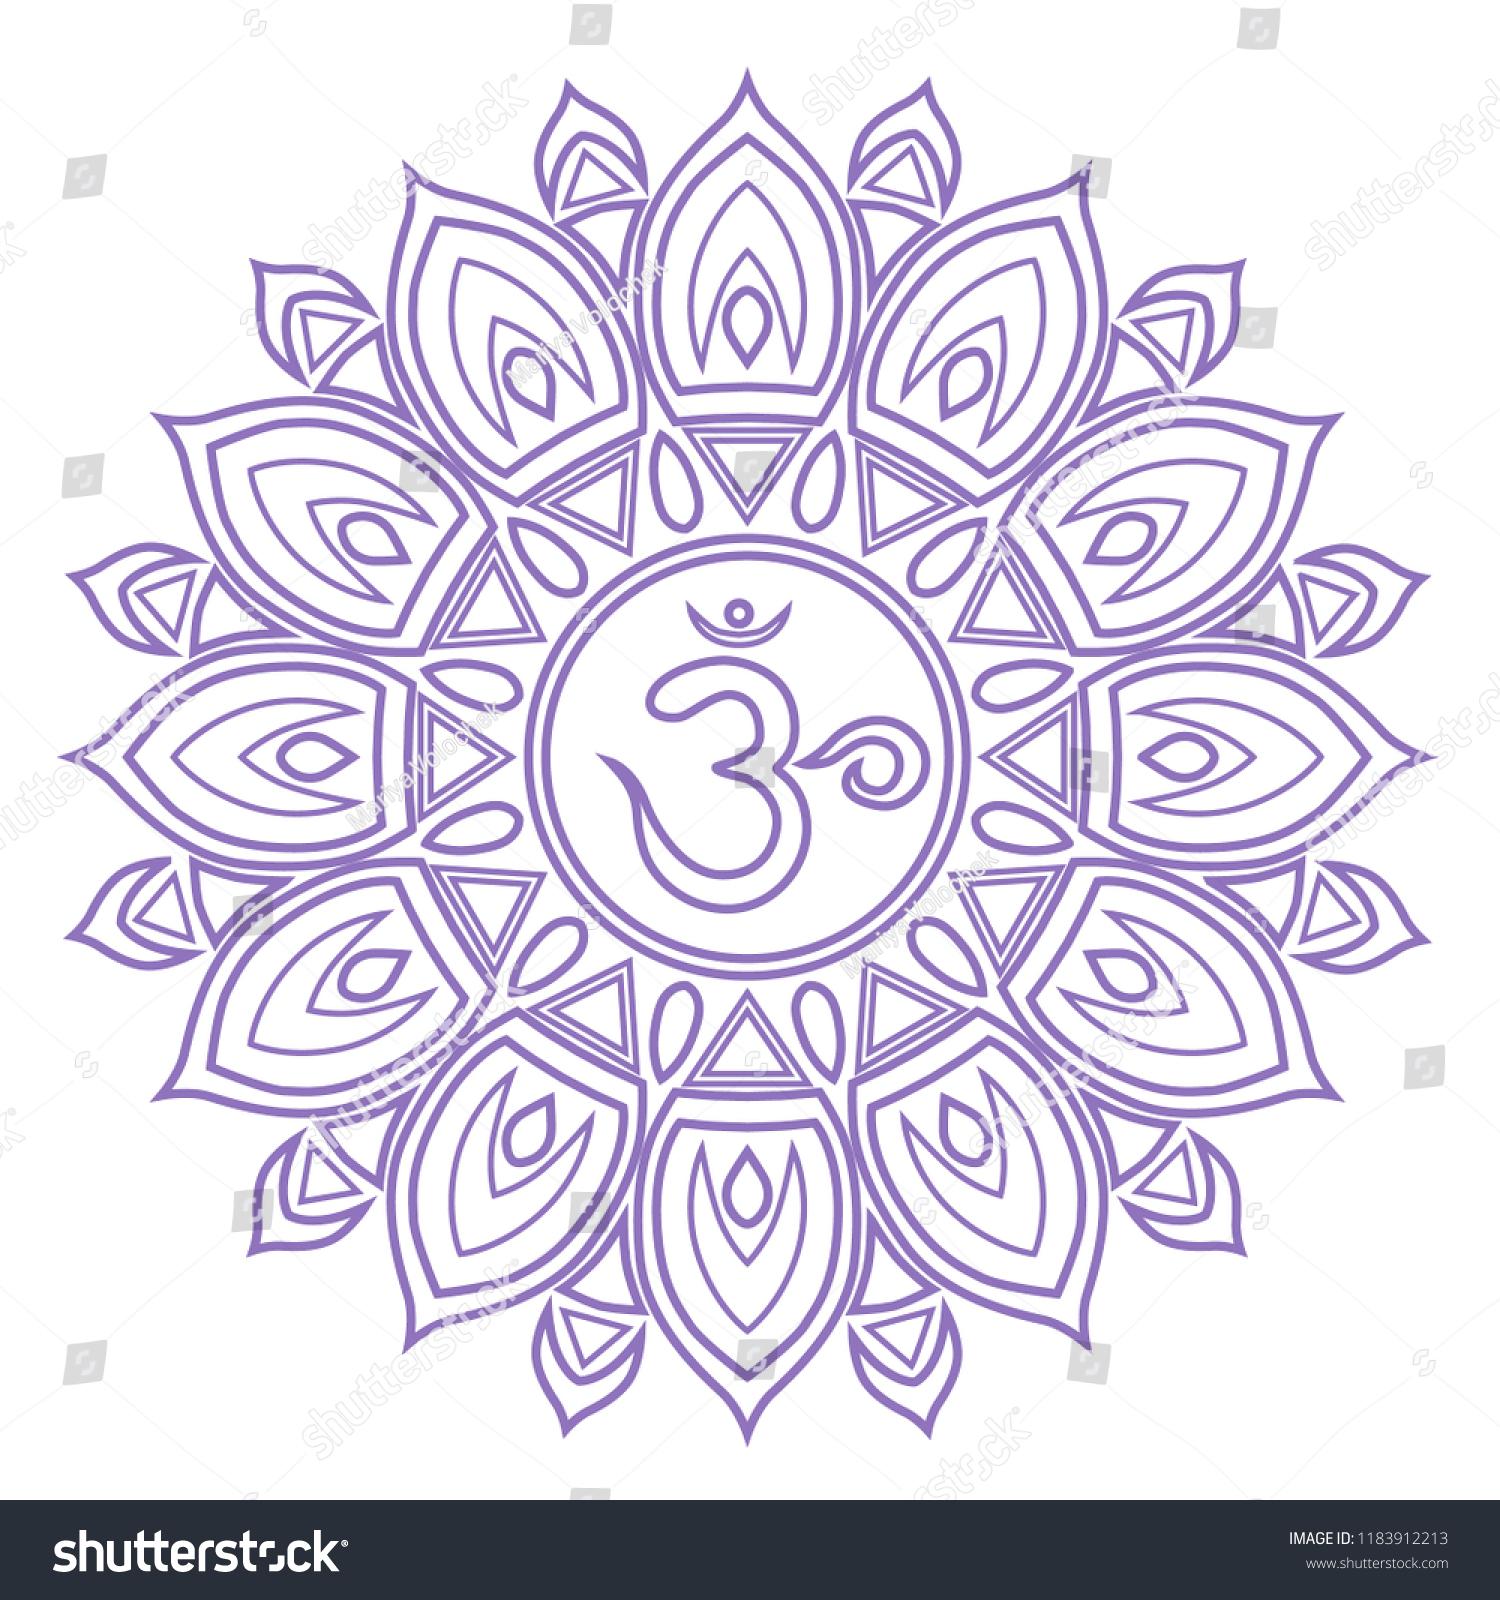 Seventh chakra man mandala meditation yoga stock vector royalty mandala for meditation and yoga the meaning of the izmirmasajfo